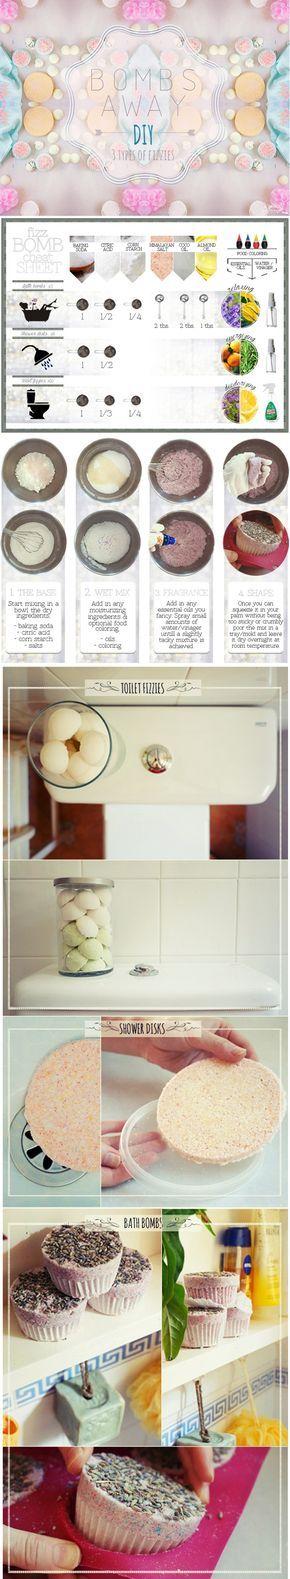 How to DIY bath, shower and toilet fizzies! diy bath bombs, shower fizzies and toilet fizzies  | Your Beauty Script